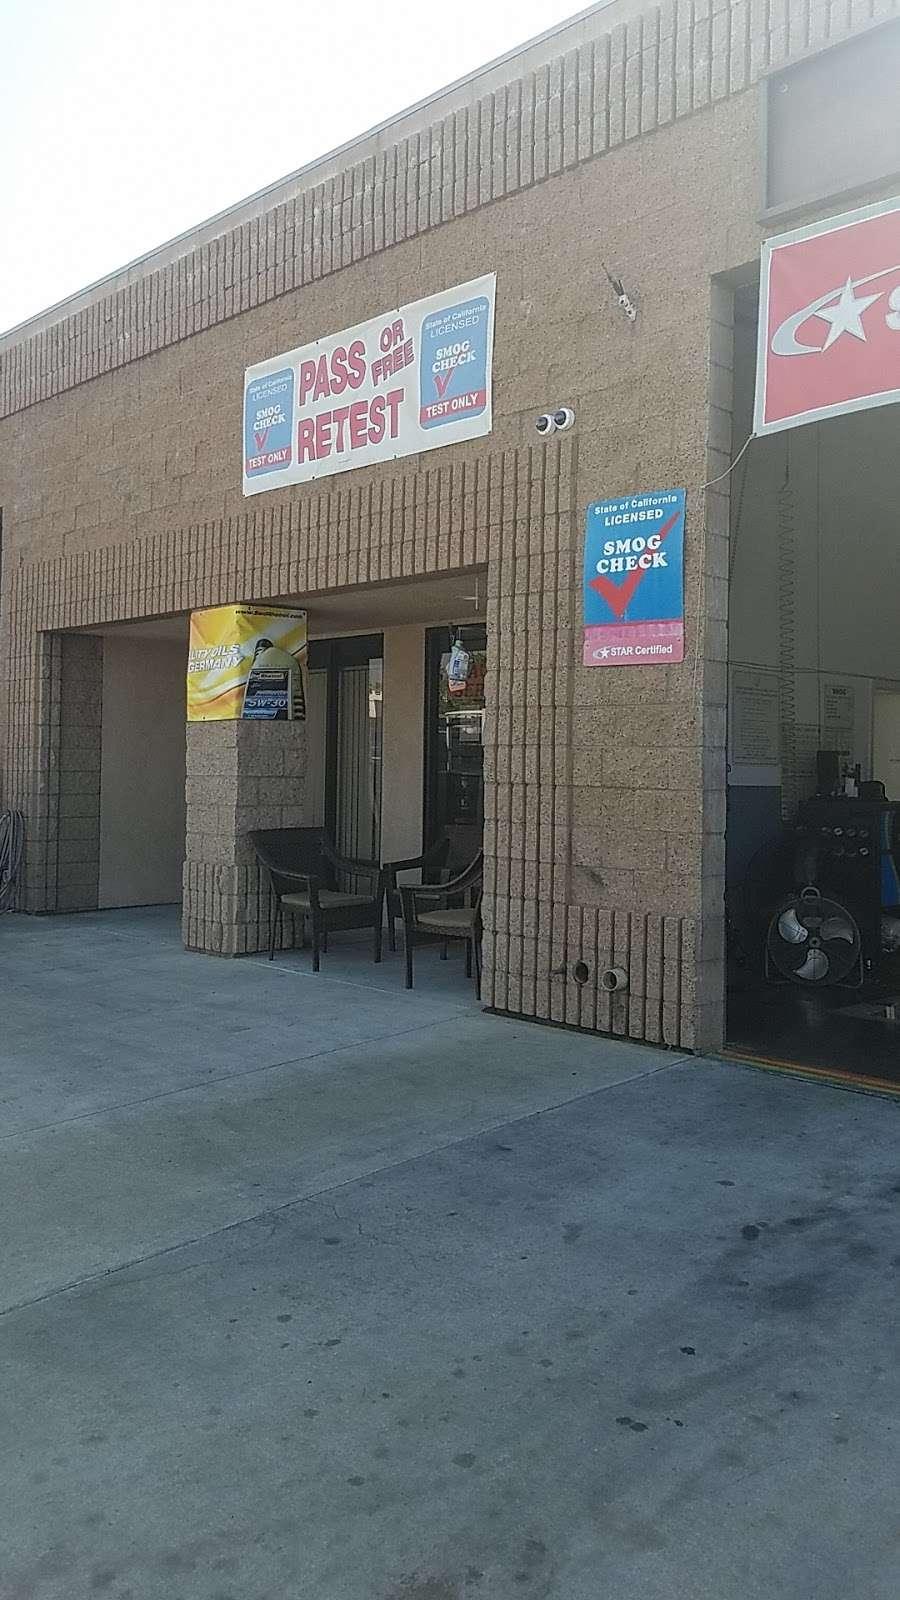 Covina Test Only - car repair    Photo 2 of 2   Address: 650 Barranca Ave # C, Covina, CA 91723, USA   Phone: (626) 610-6975